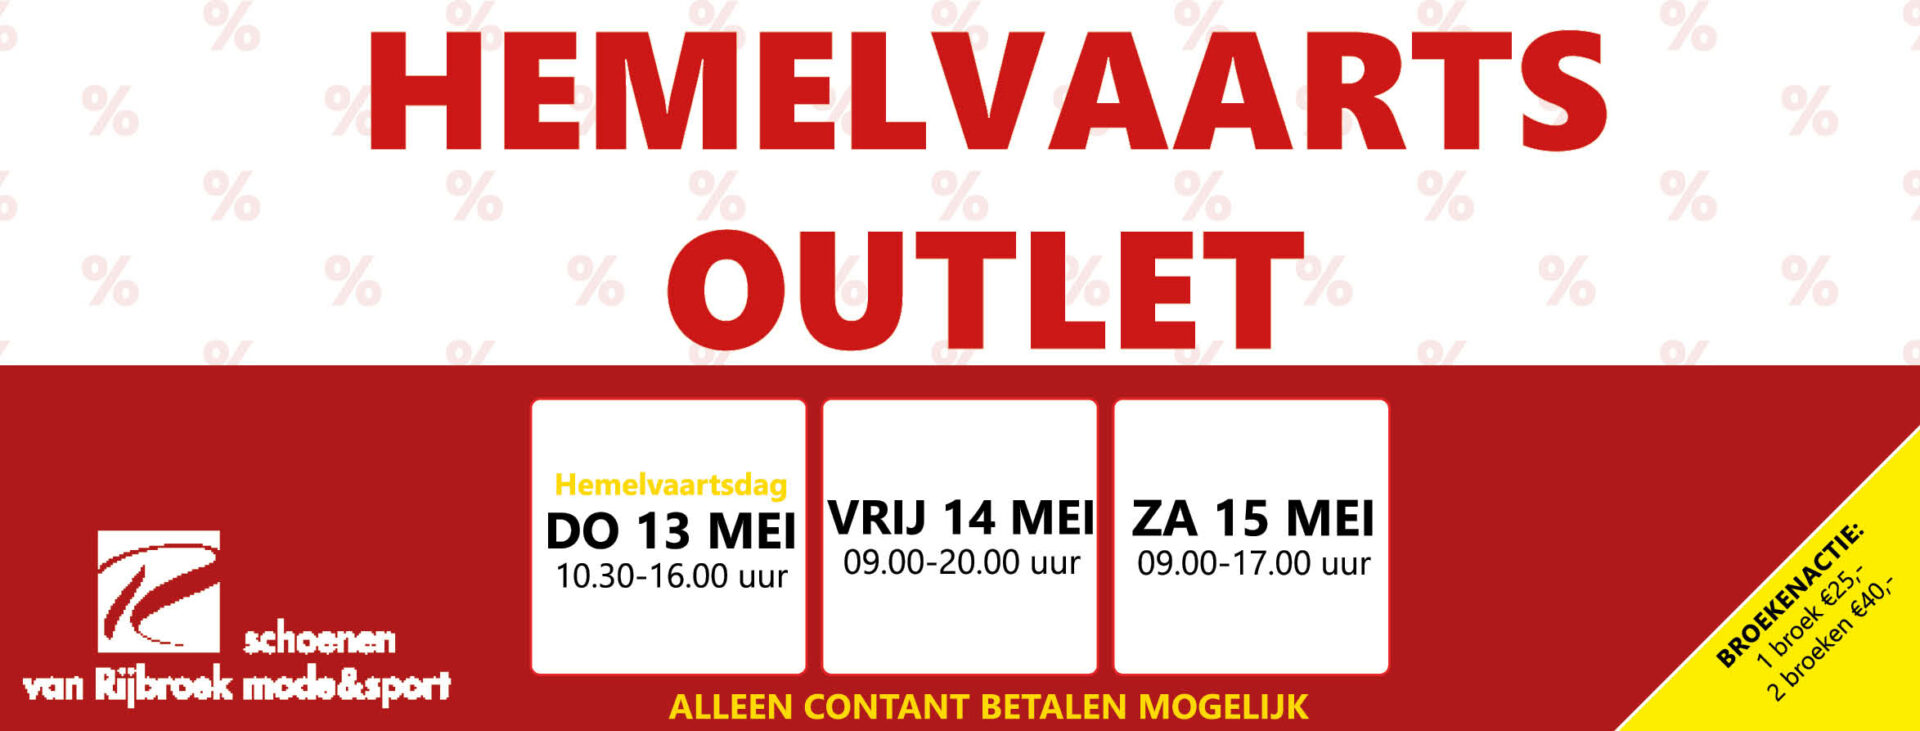 Hemelvaarts outlet